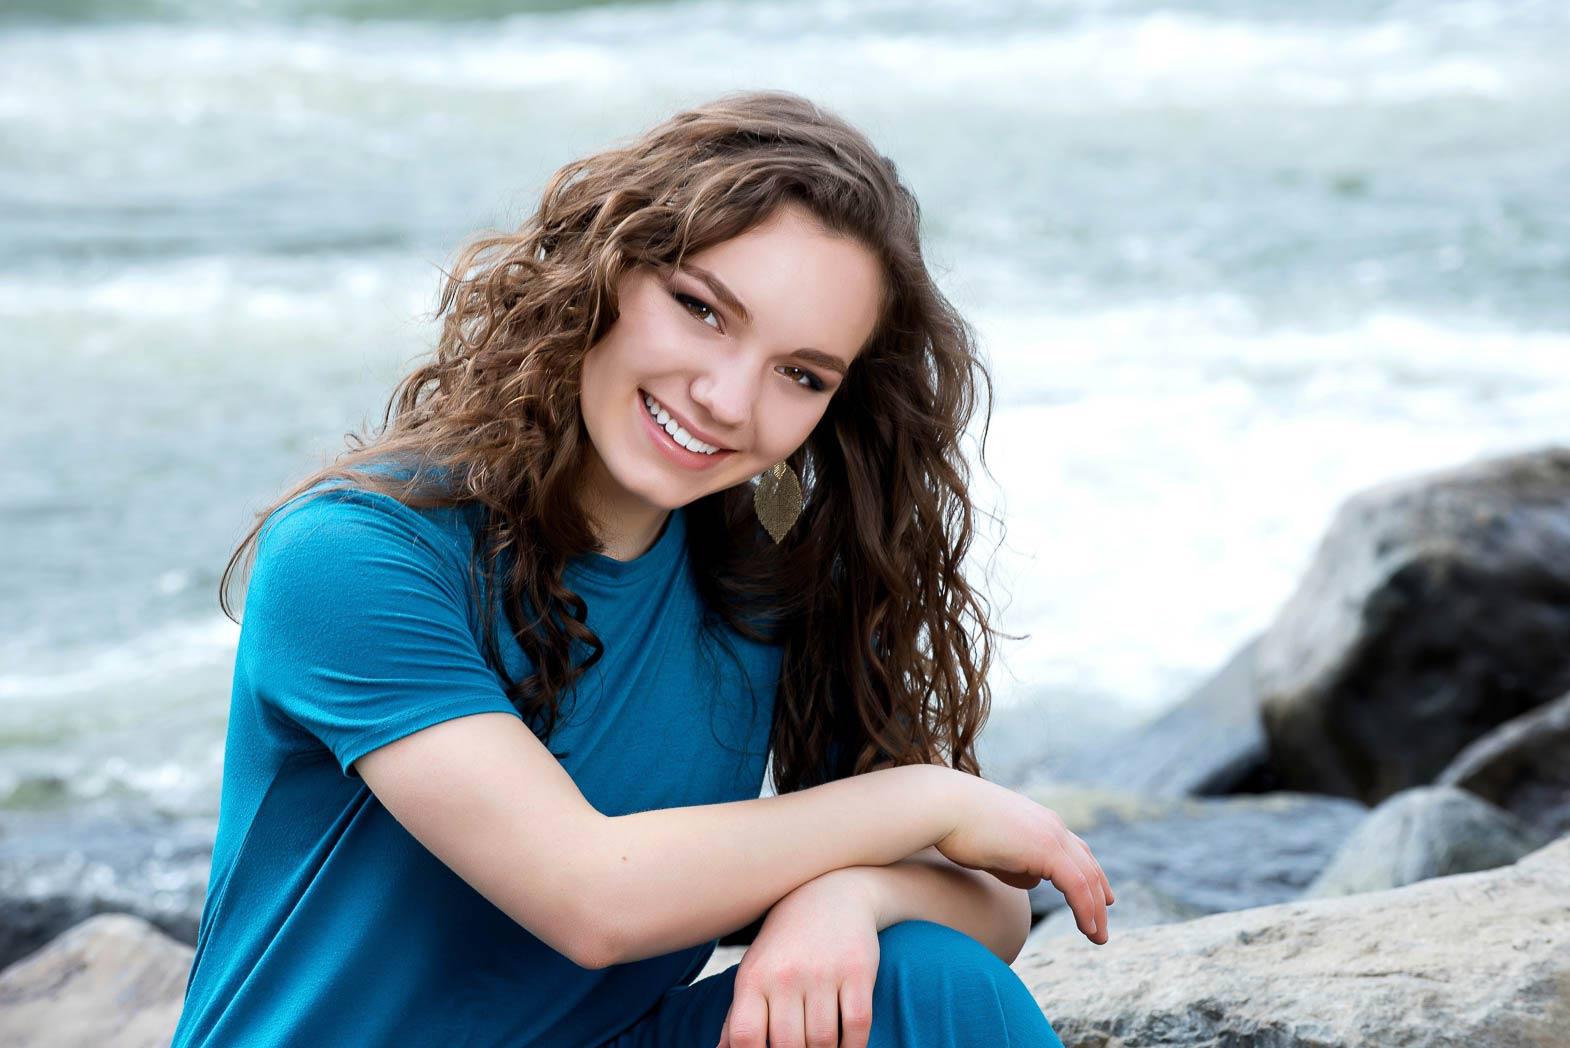 senior portrait of girl smiling sitting by river